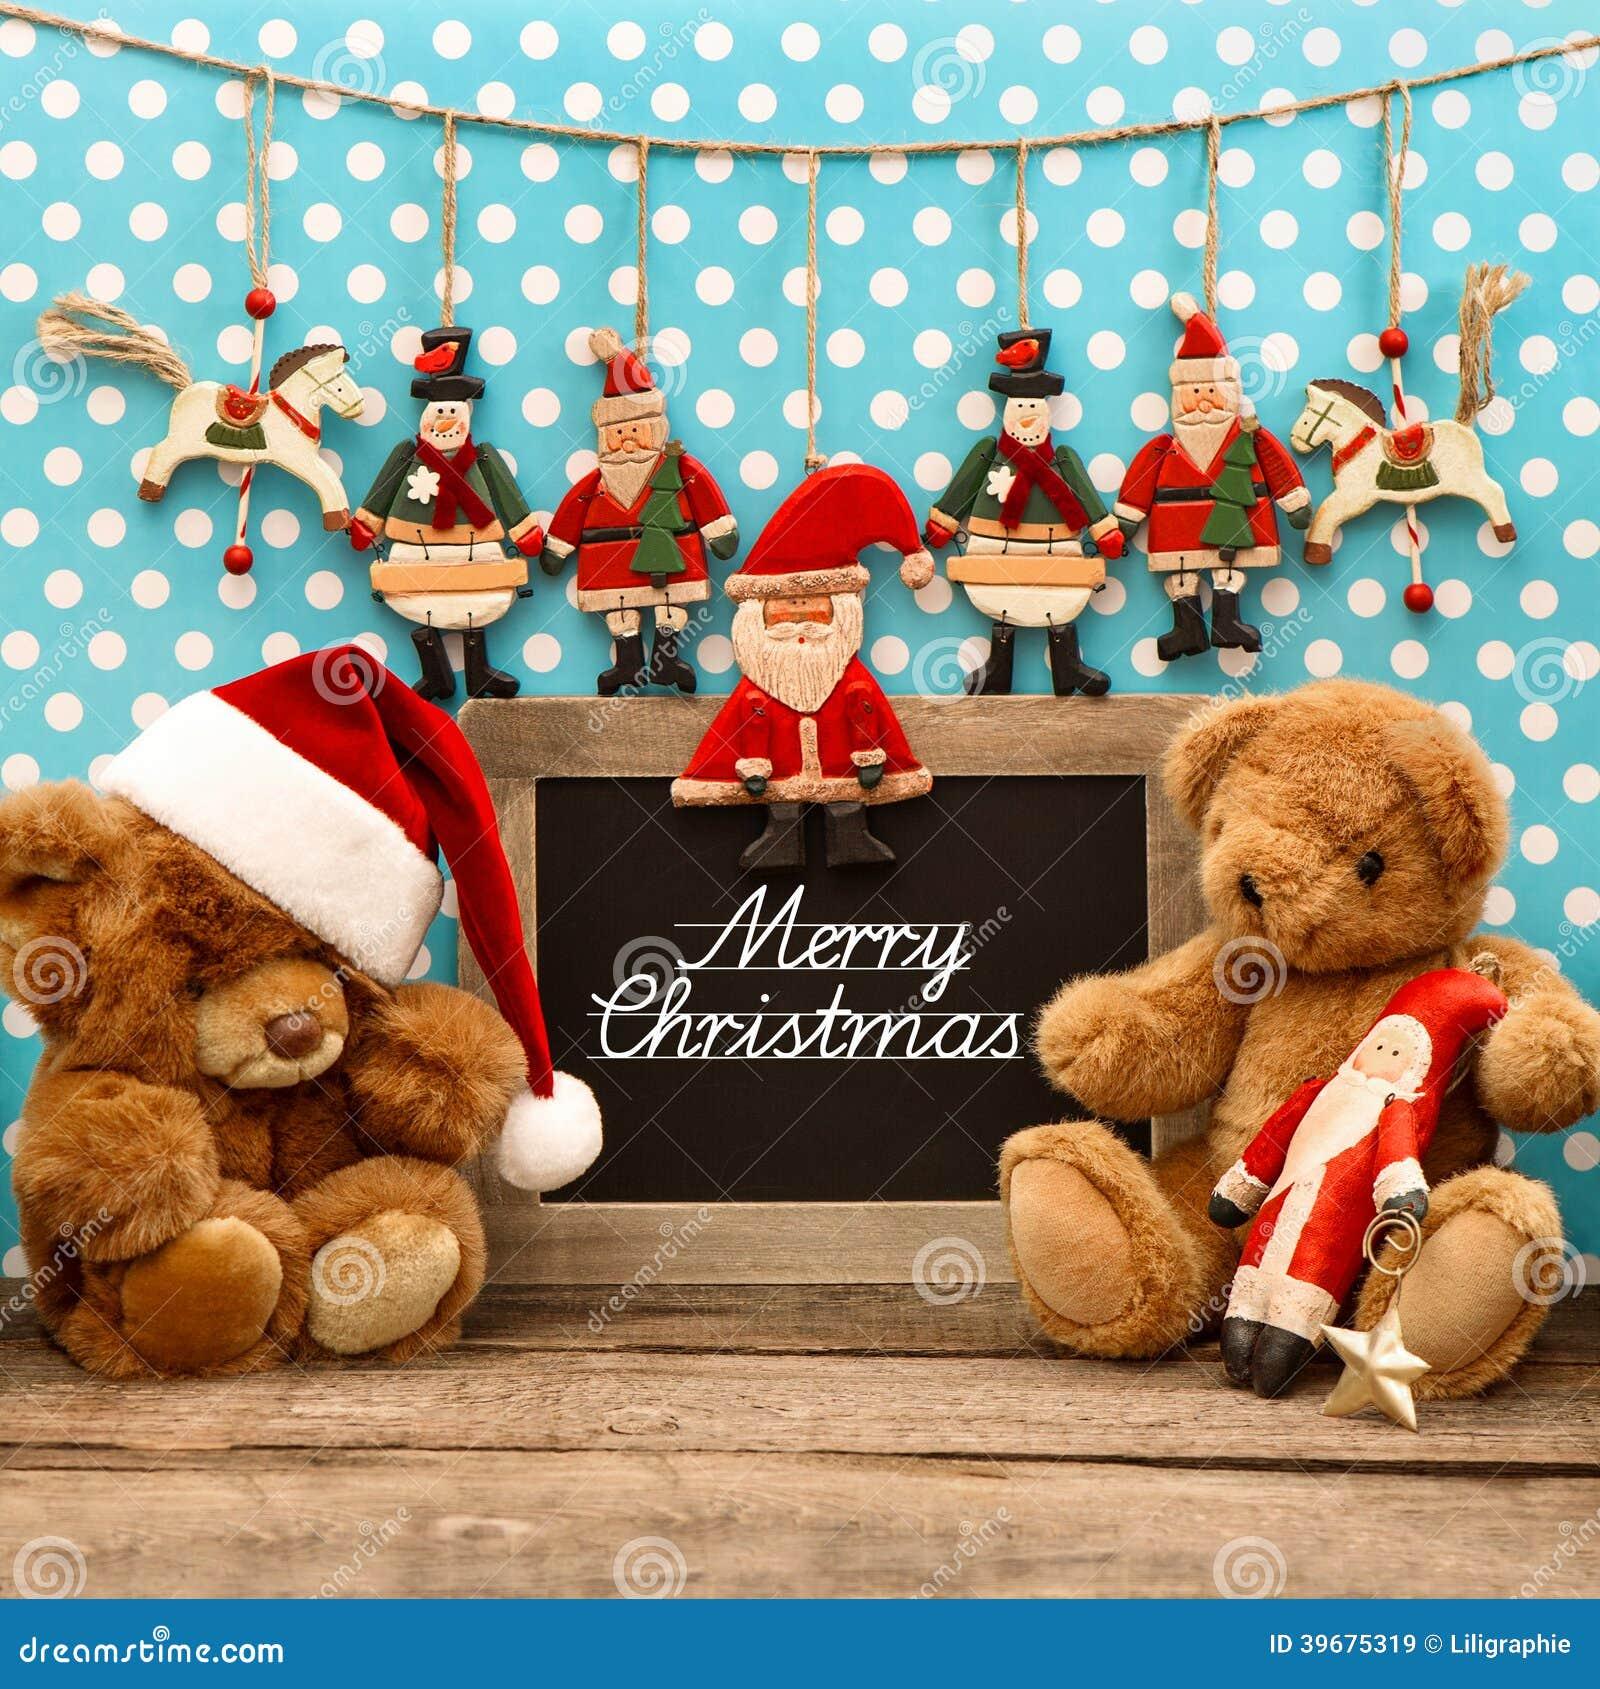 Nostalgic Christmas Decorations: Nostalgic Home Christmas Decoration With Antique Toys